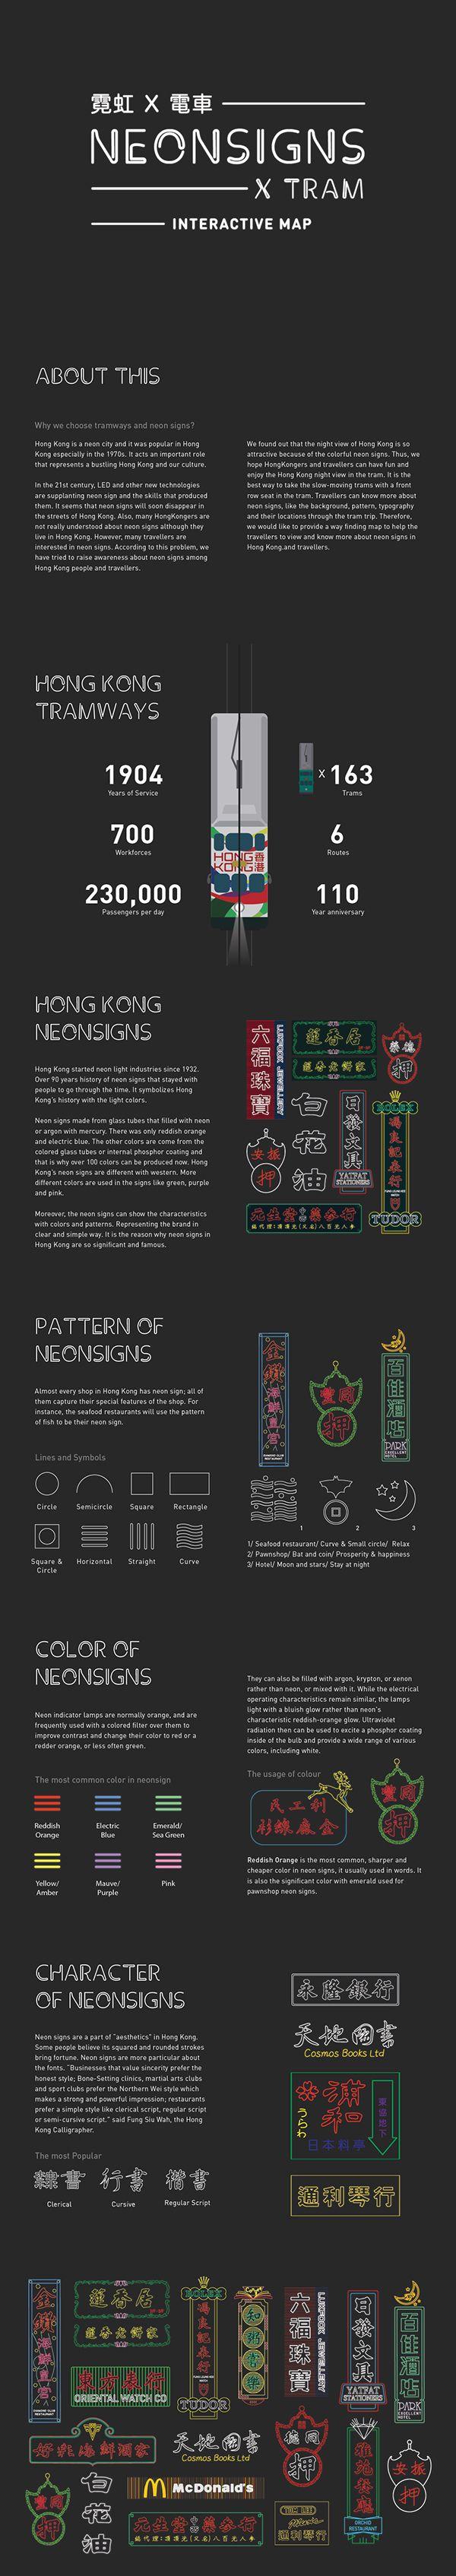 霓虹 X 電車 Neon Signs X Tram by Kylie Lee, via Behance